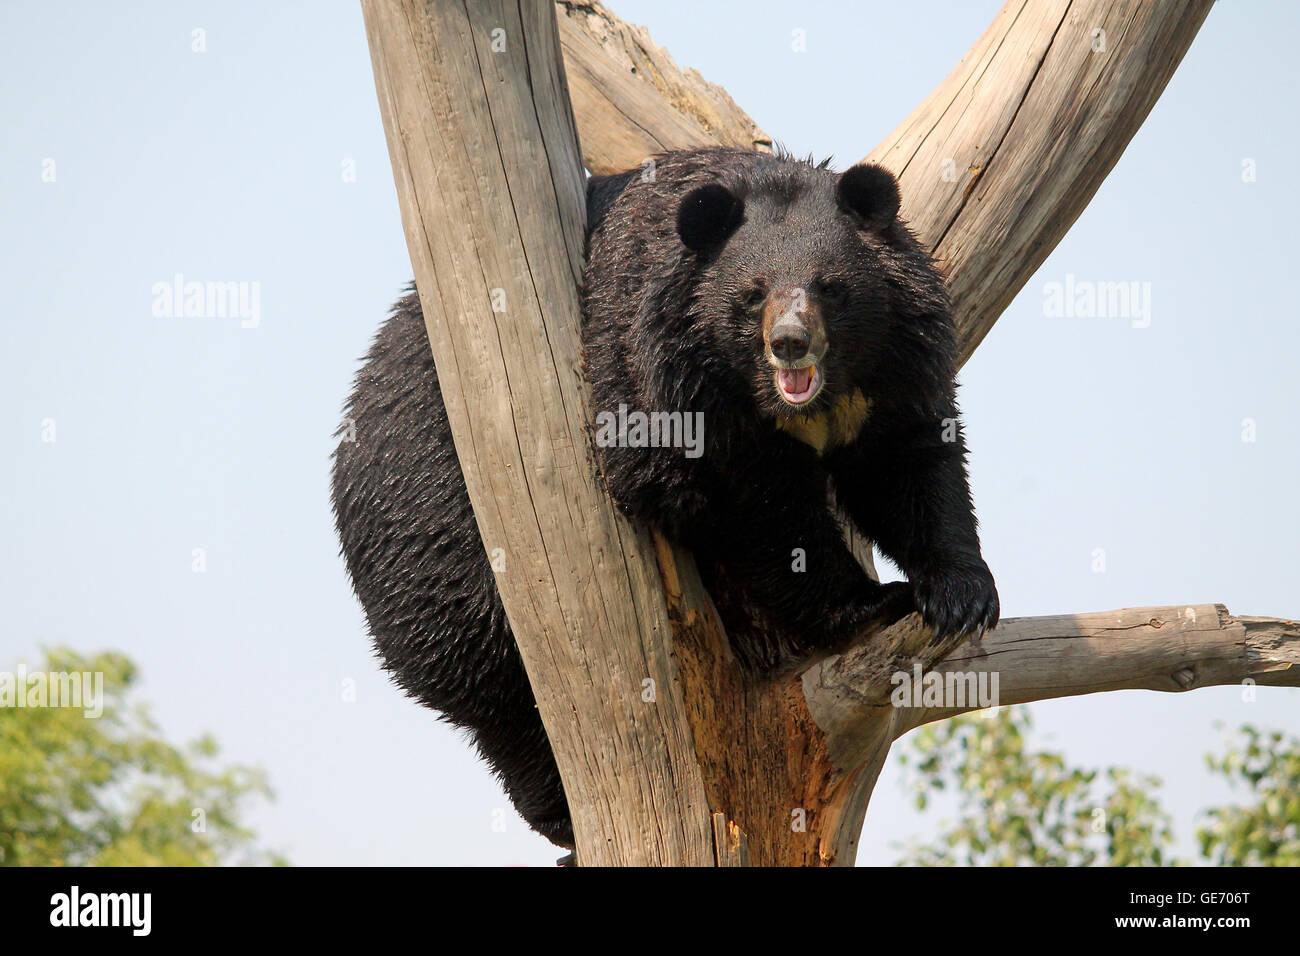 Asian Black Bear or the Himalayan Black Bear (Ursus thibetanus or Selenarctos thibetanus) at National Zoological - Stock Image